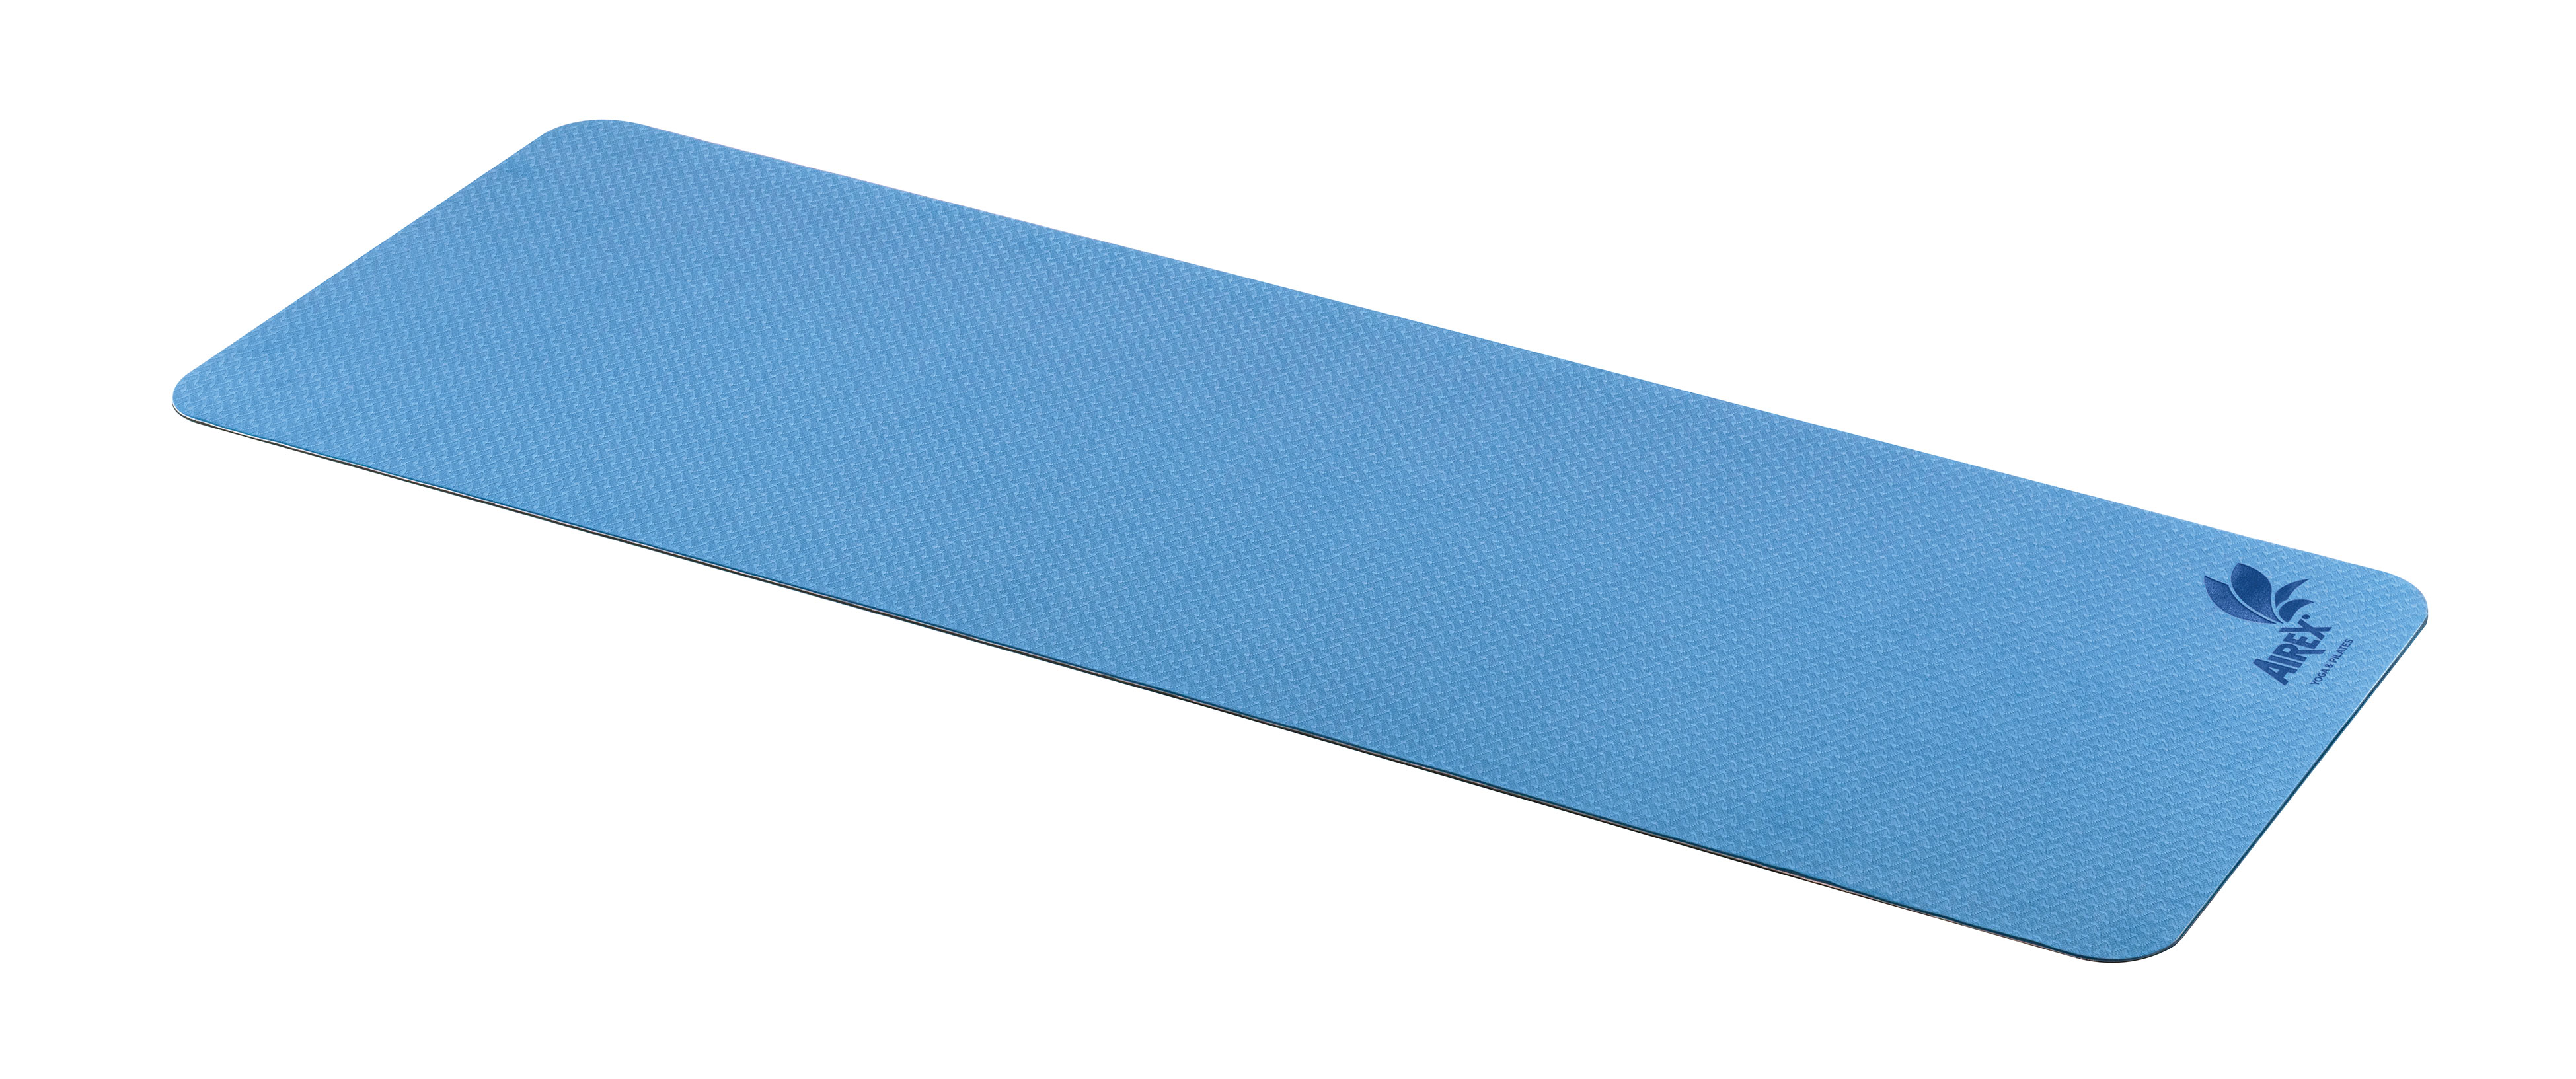 Yoga Eco Pro mat